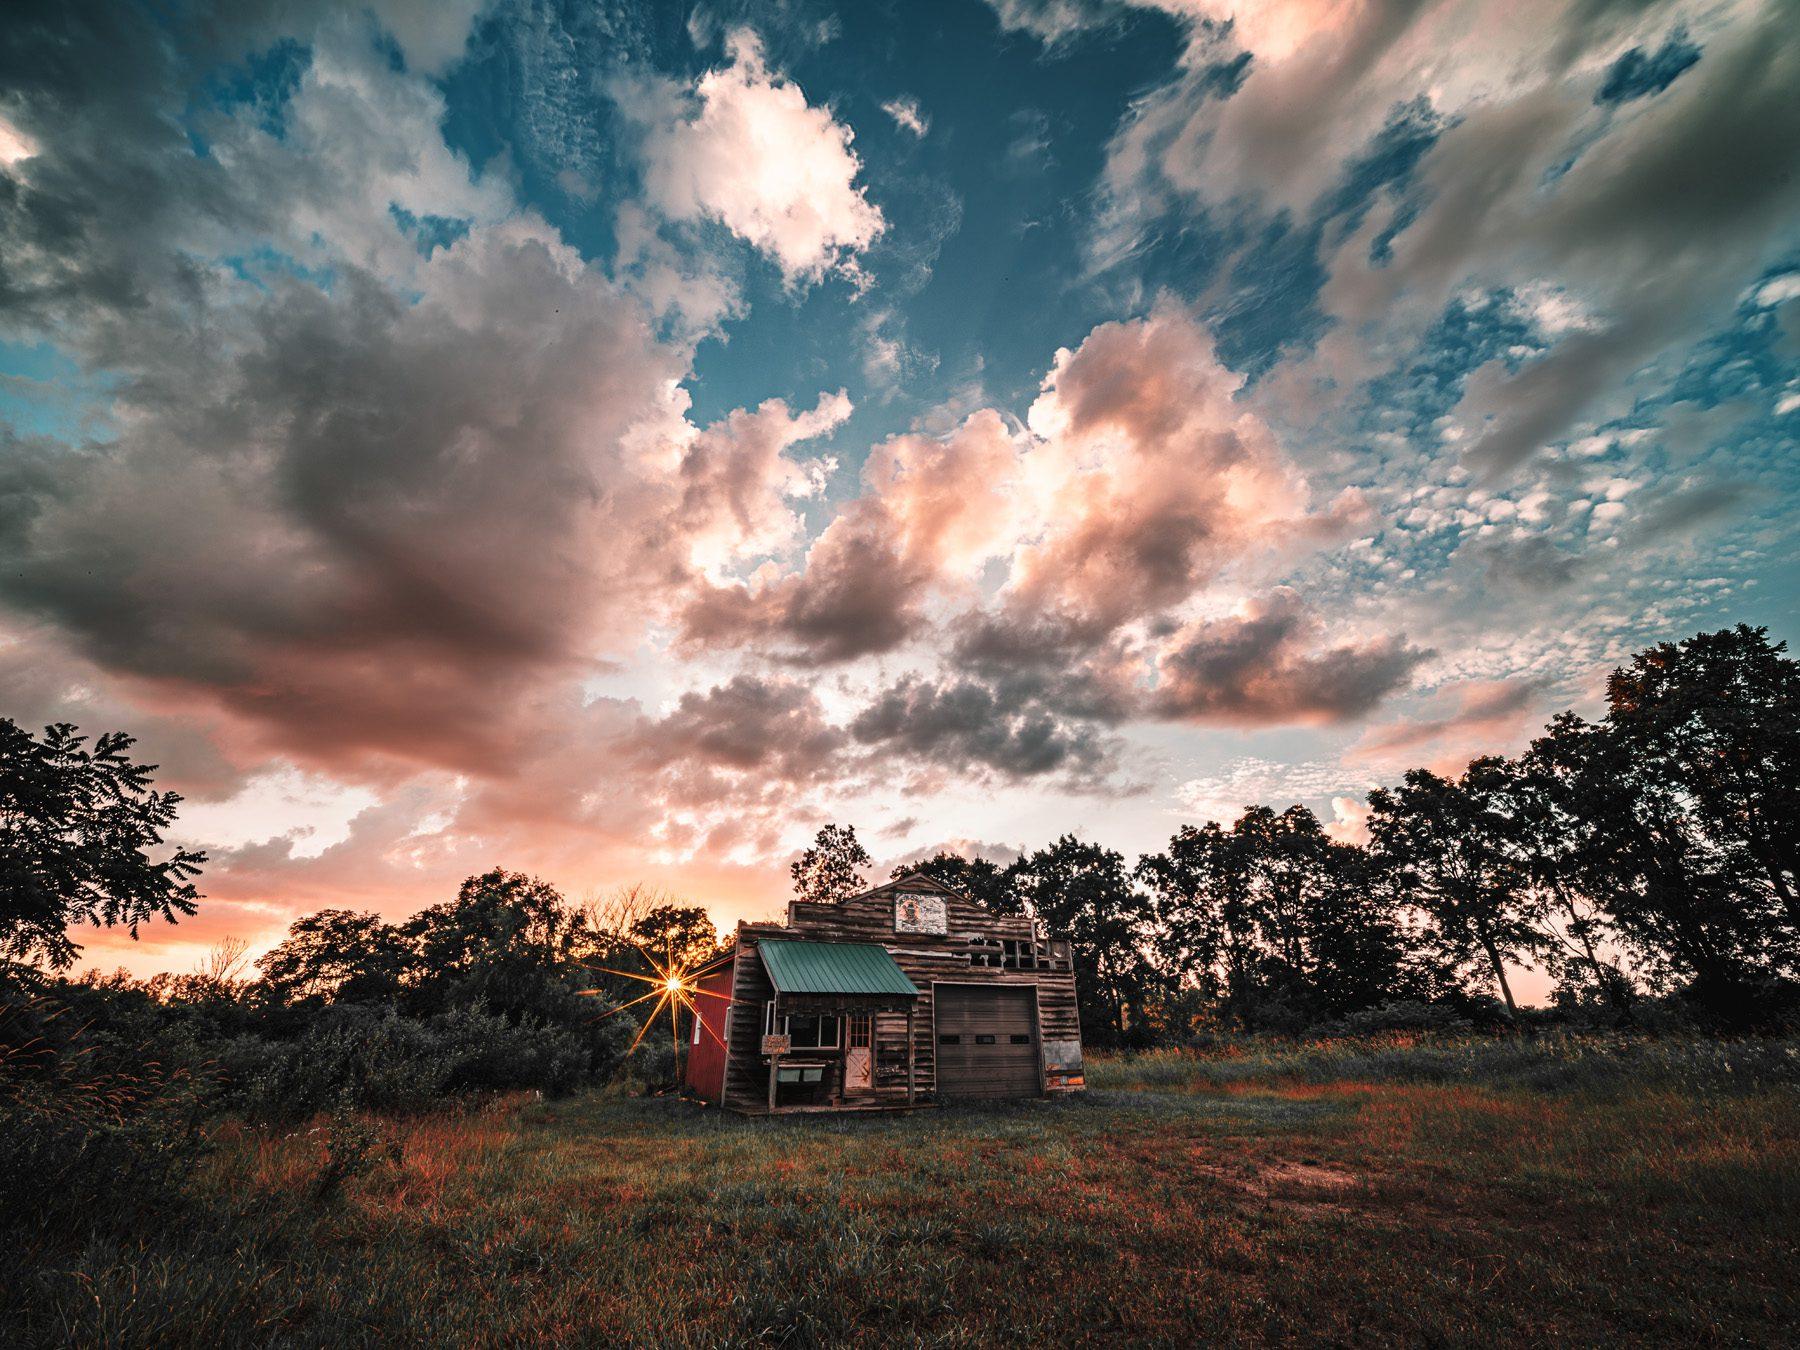 © Bryan Minear